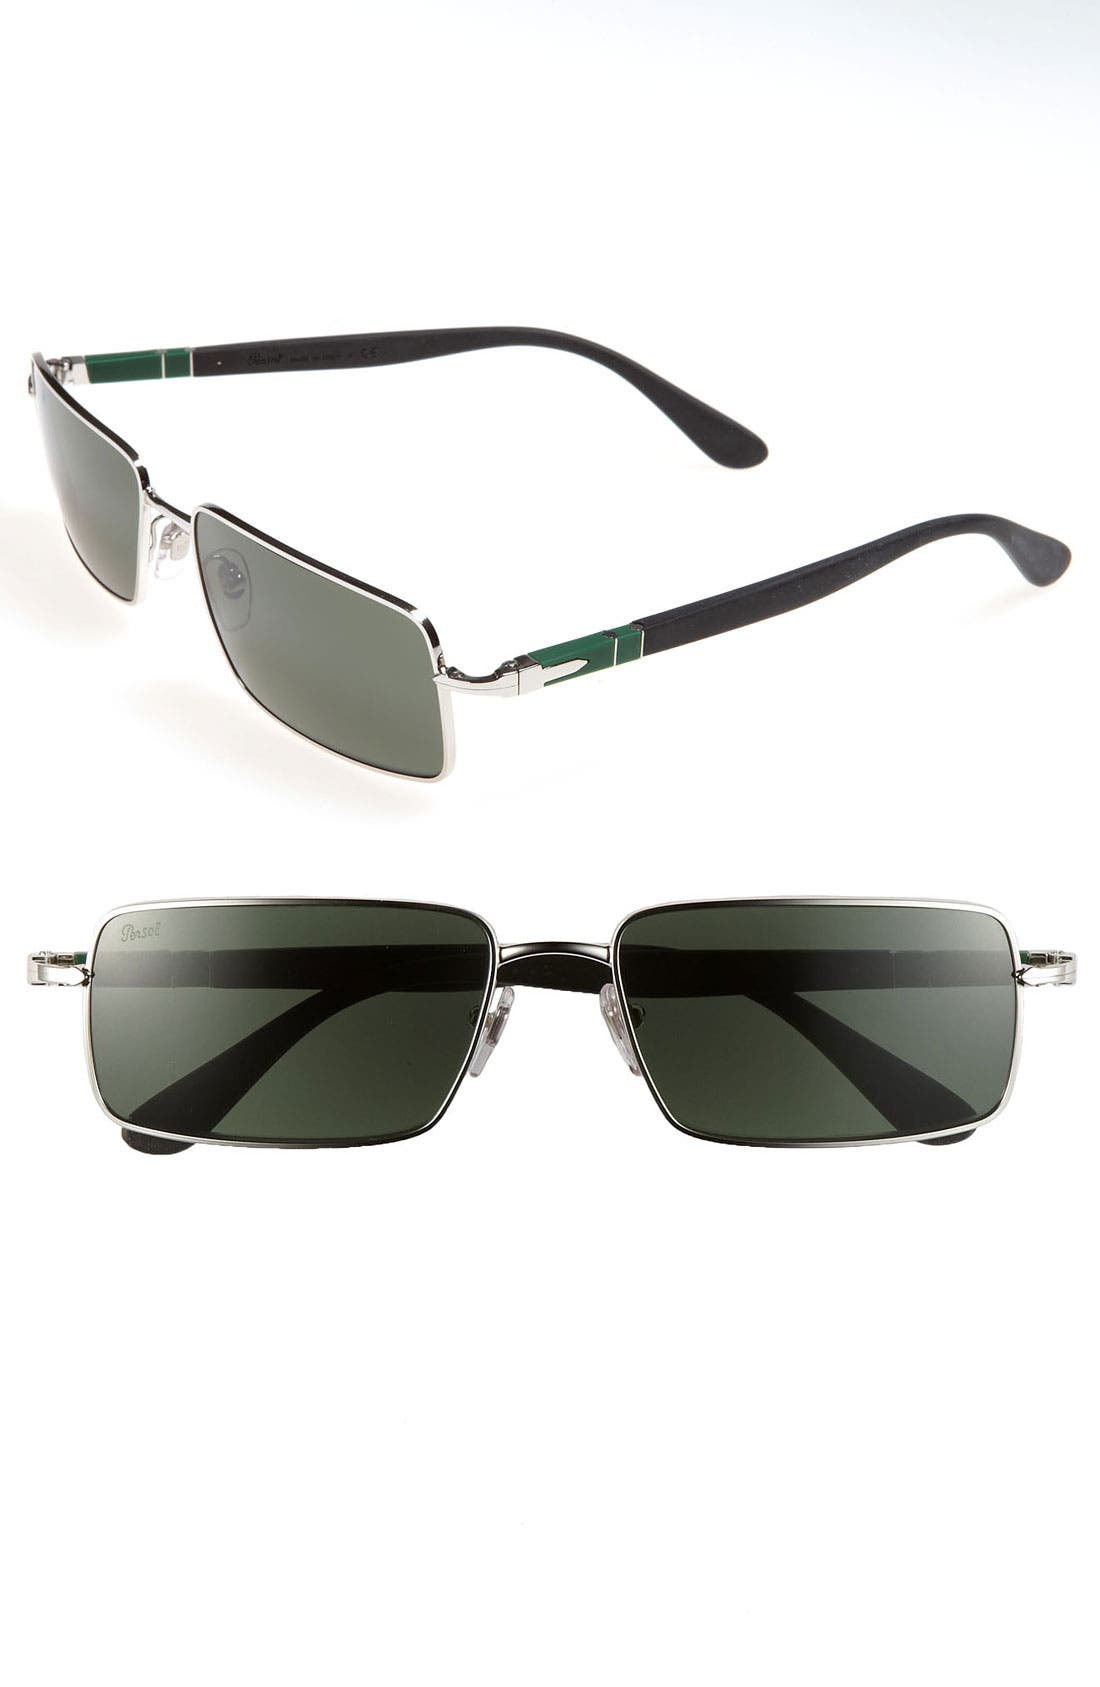 Alternate Image 1 Selected - Persol 'Steelman' Sunglasses